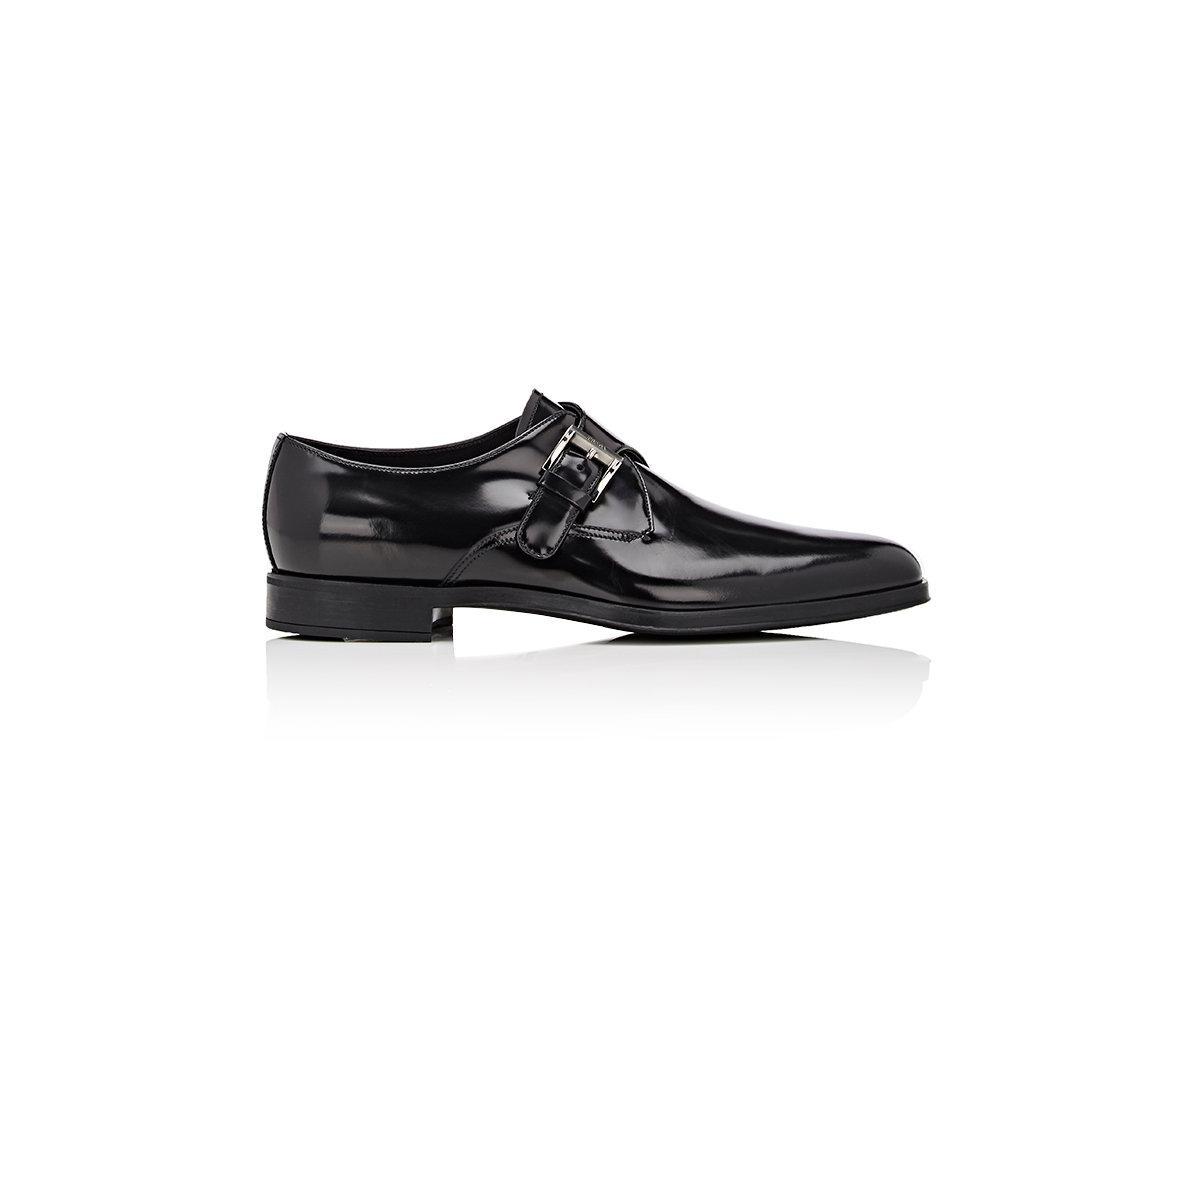 Prada Mens Double Monk Strap Shoes